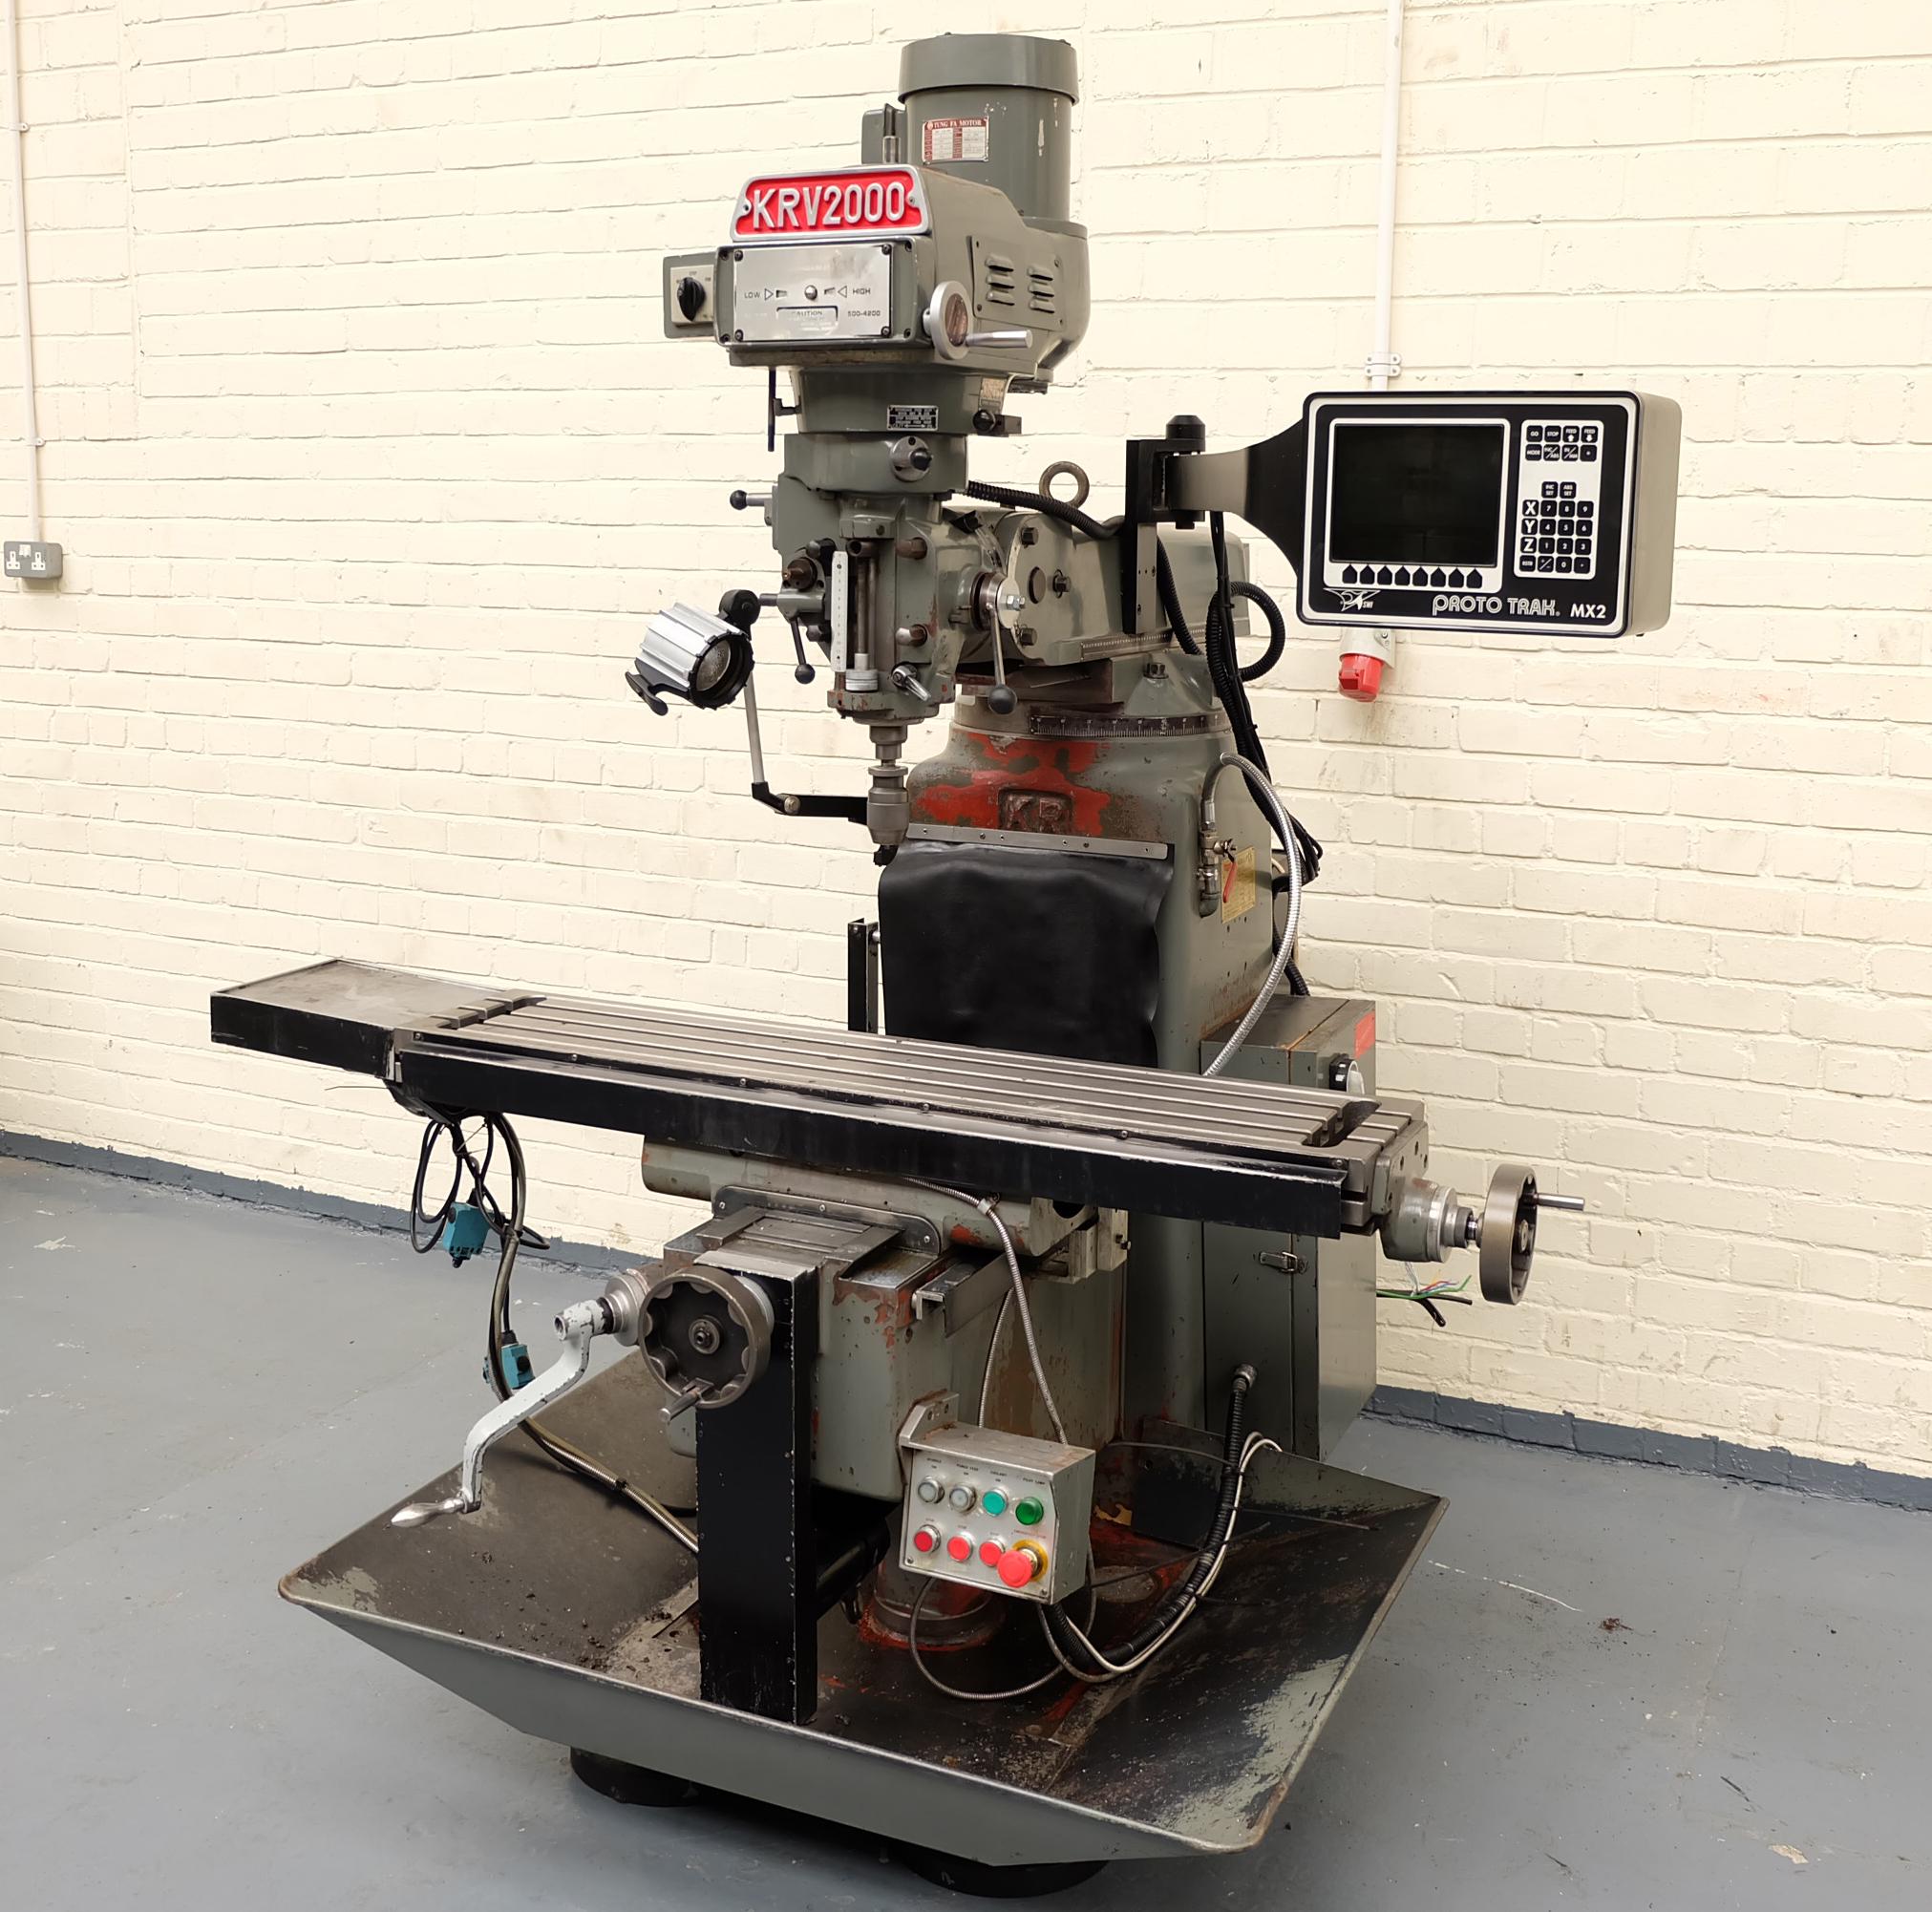 a king rich krv 2000 turret mill prototrak mx2 control table size rh bidspotter co uk